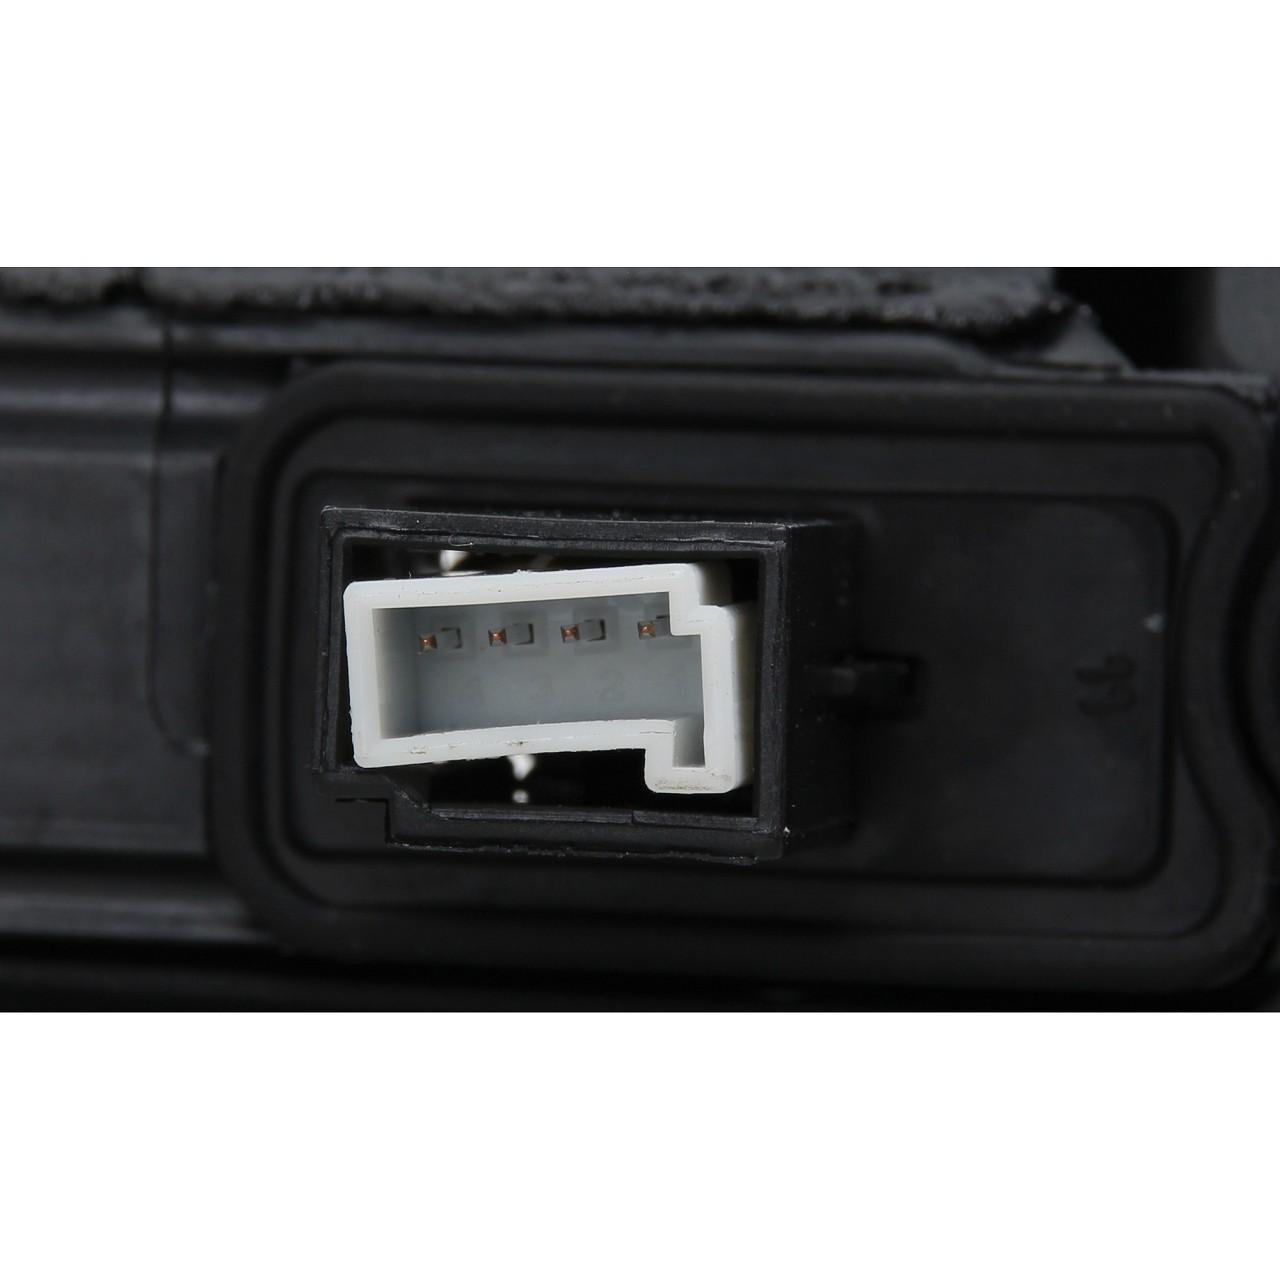 ORIGINAL Mini Heckklappengriff Griffleiste R56 R55 R57 R58 R59 51132753603